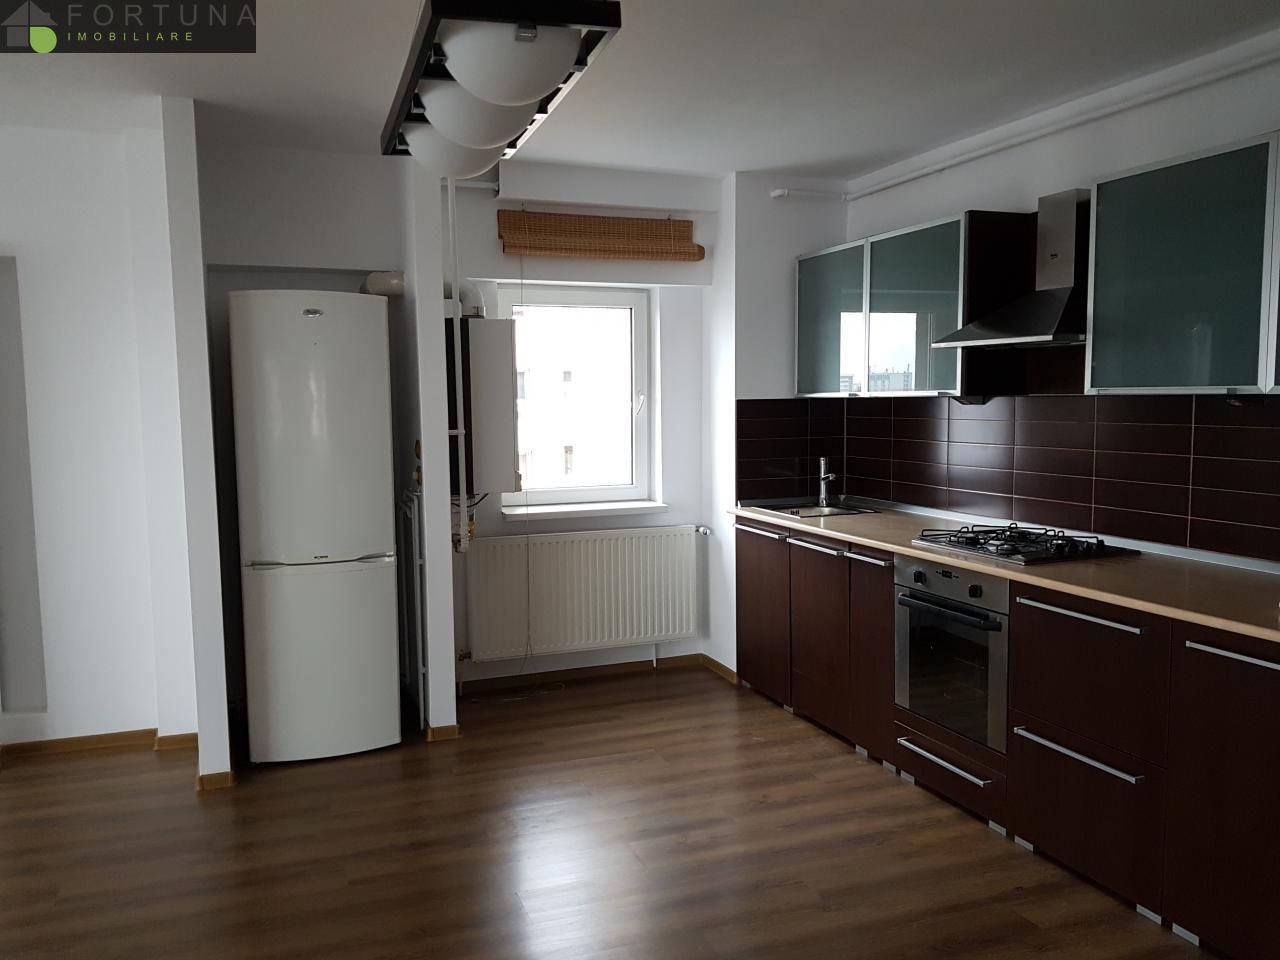 Apartament de inchiriat, Brașov (judet), Centura Brașov - Foto 1